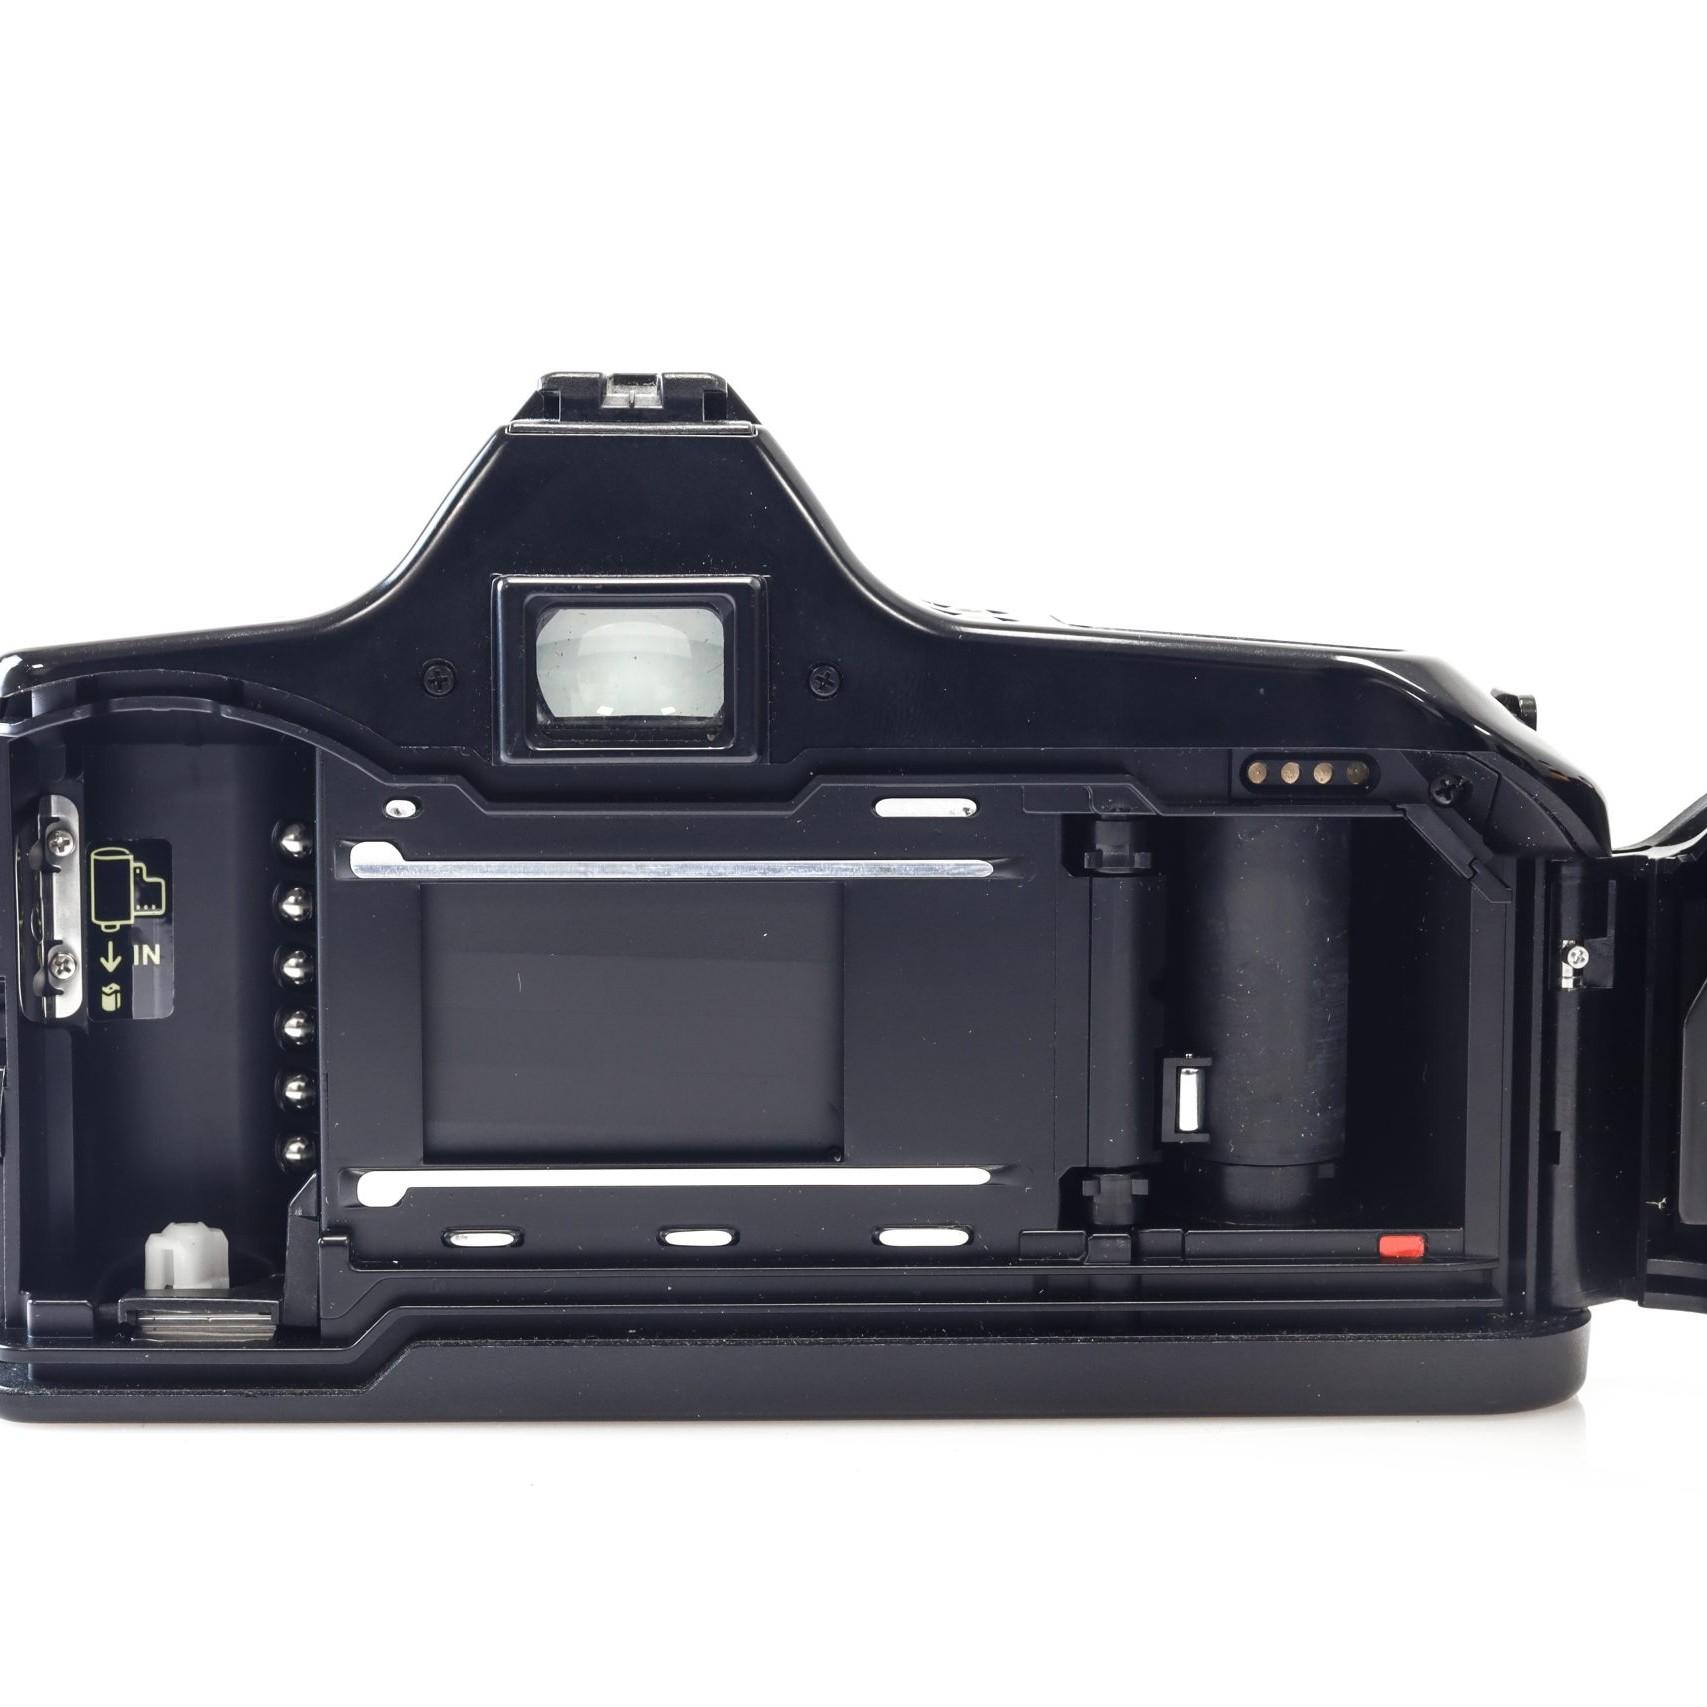 Brilliant Minolta Dynax 3000i 35mm Film Camera + Sigma AF 70-210mm Lens